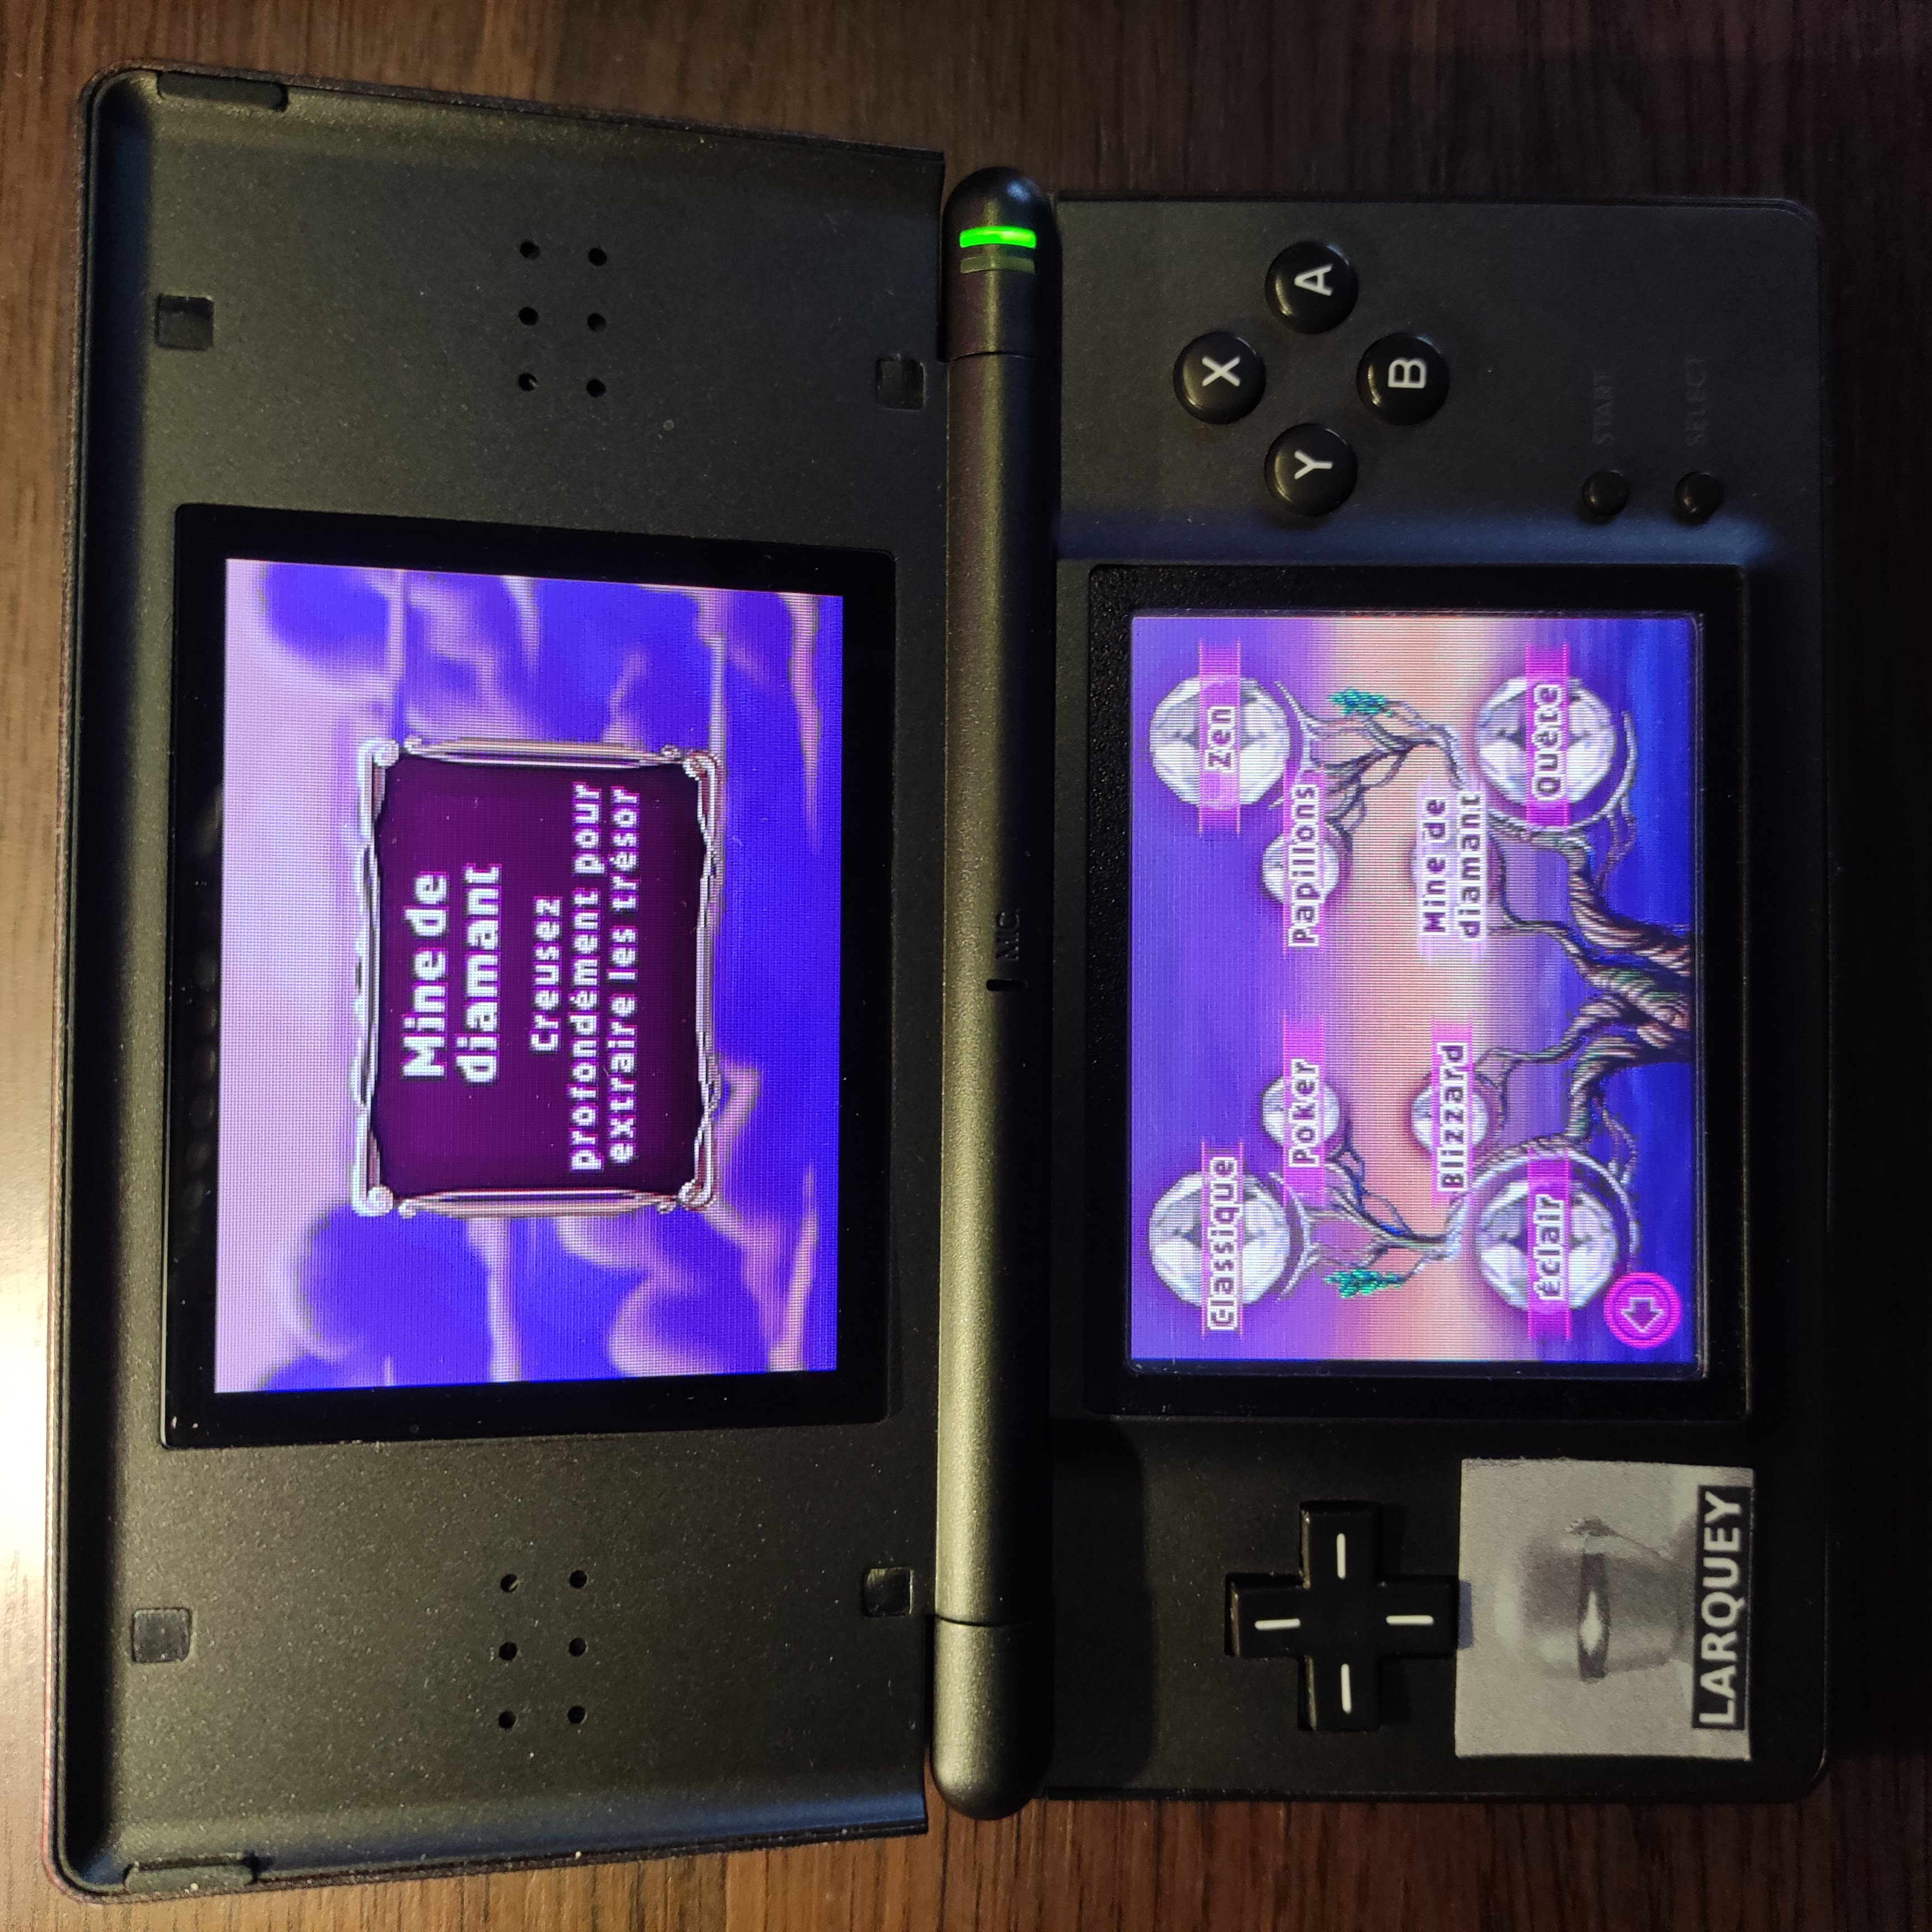 Larquey: Bejeweled 3: Diamond Mine [Diamonds Collected] (Nintendo DS) 0 points on 2020-09-27 12:58:05